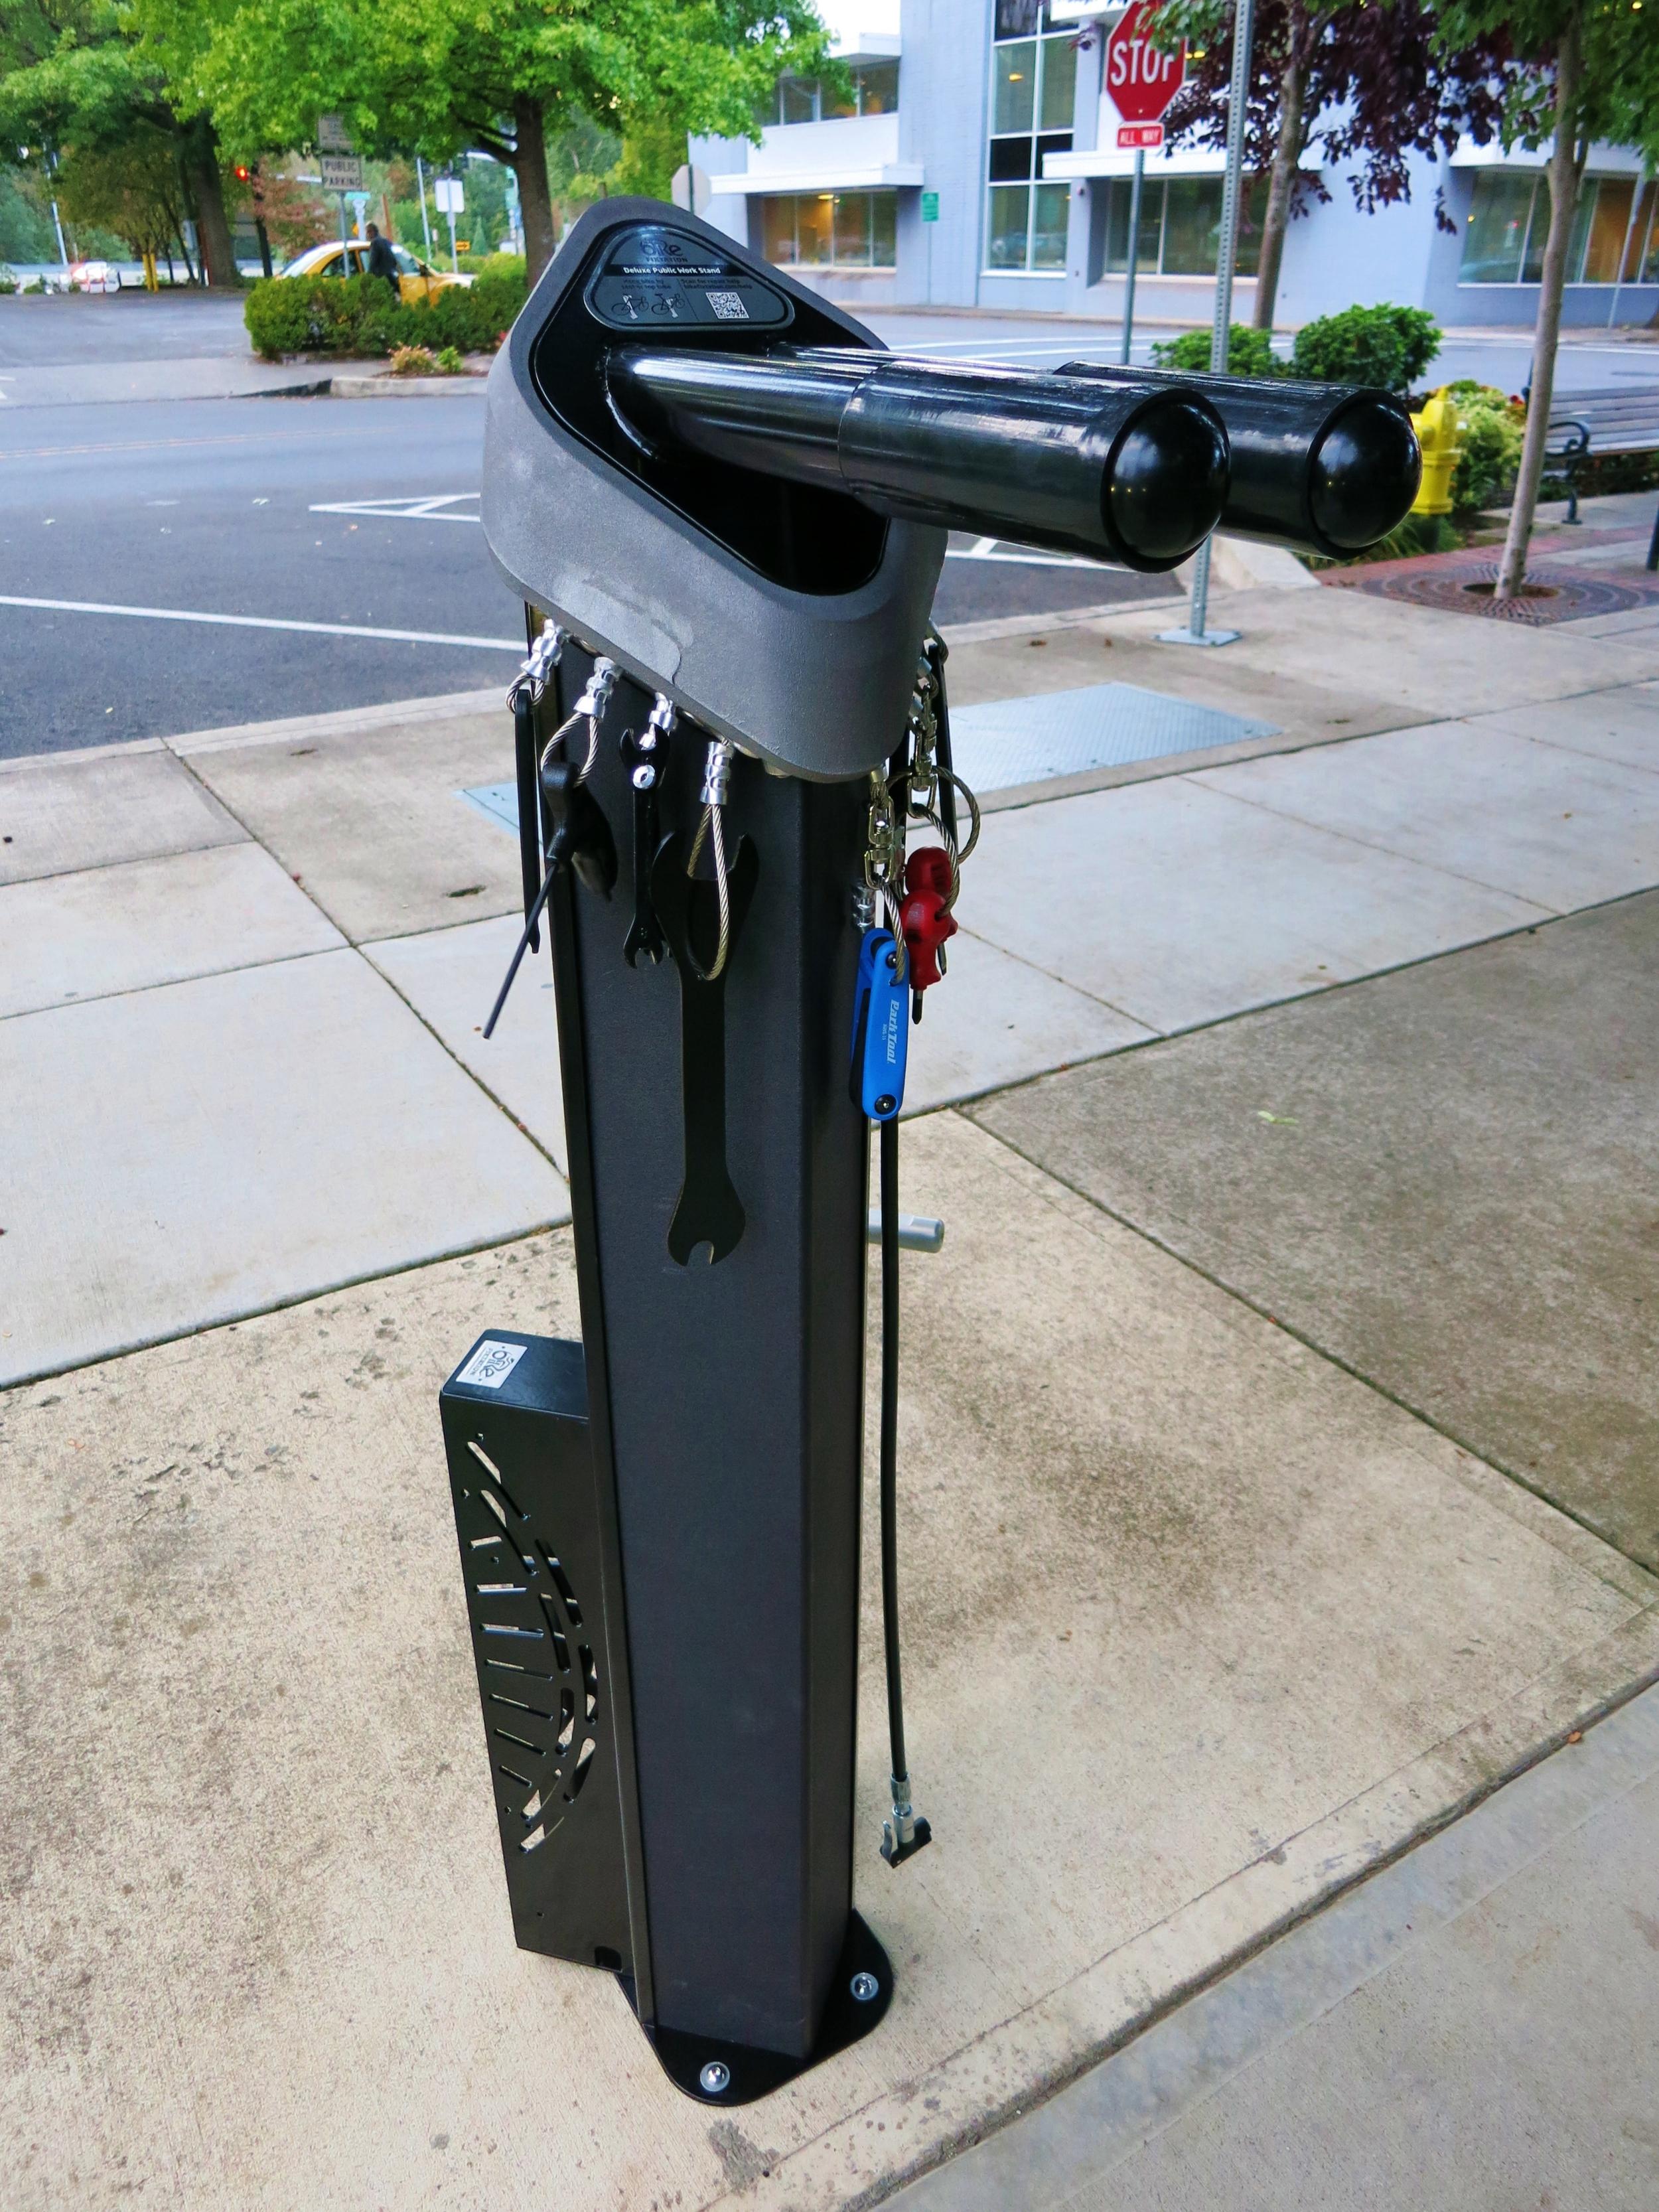 Huntco_Bike_Repair_Stand.jpg